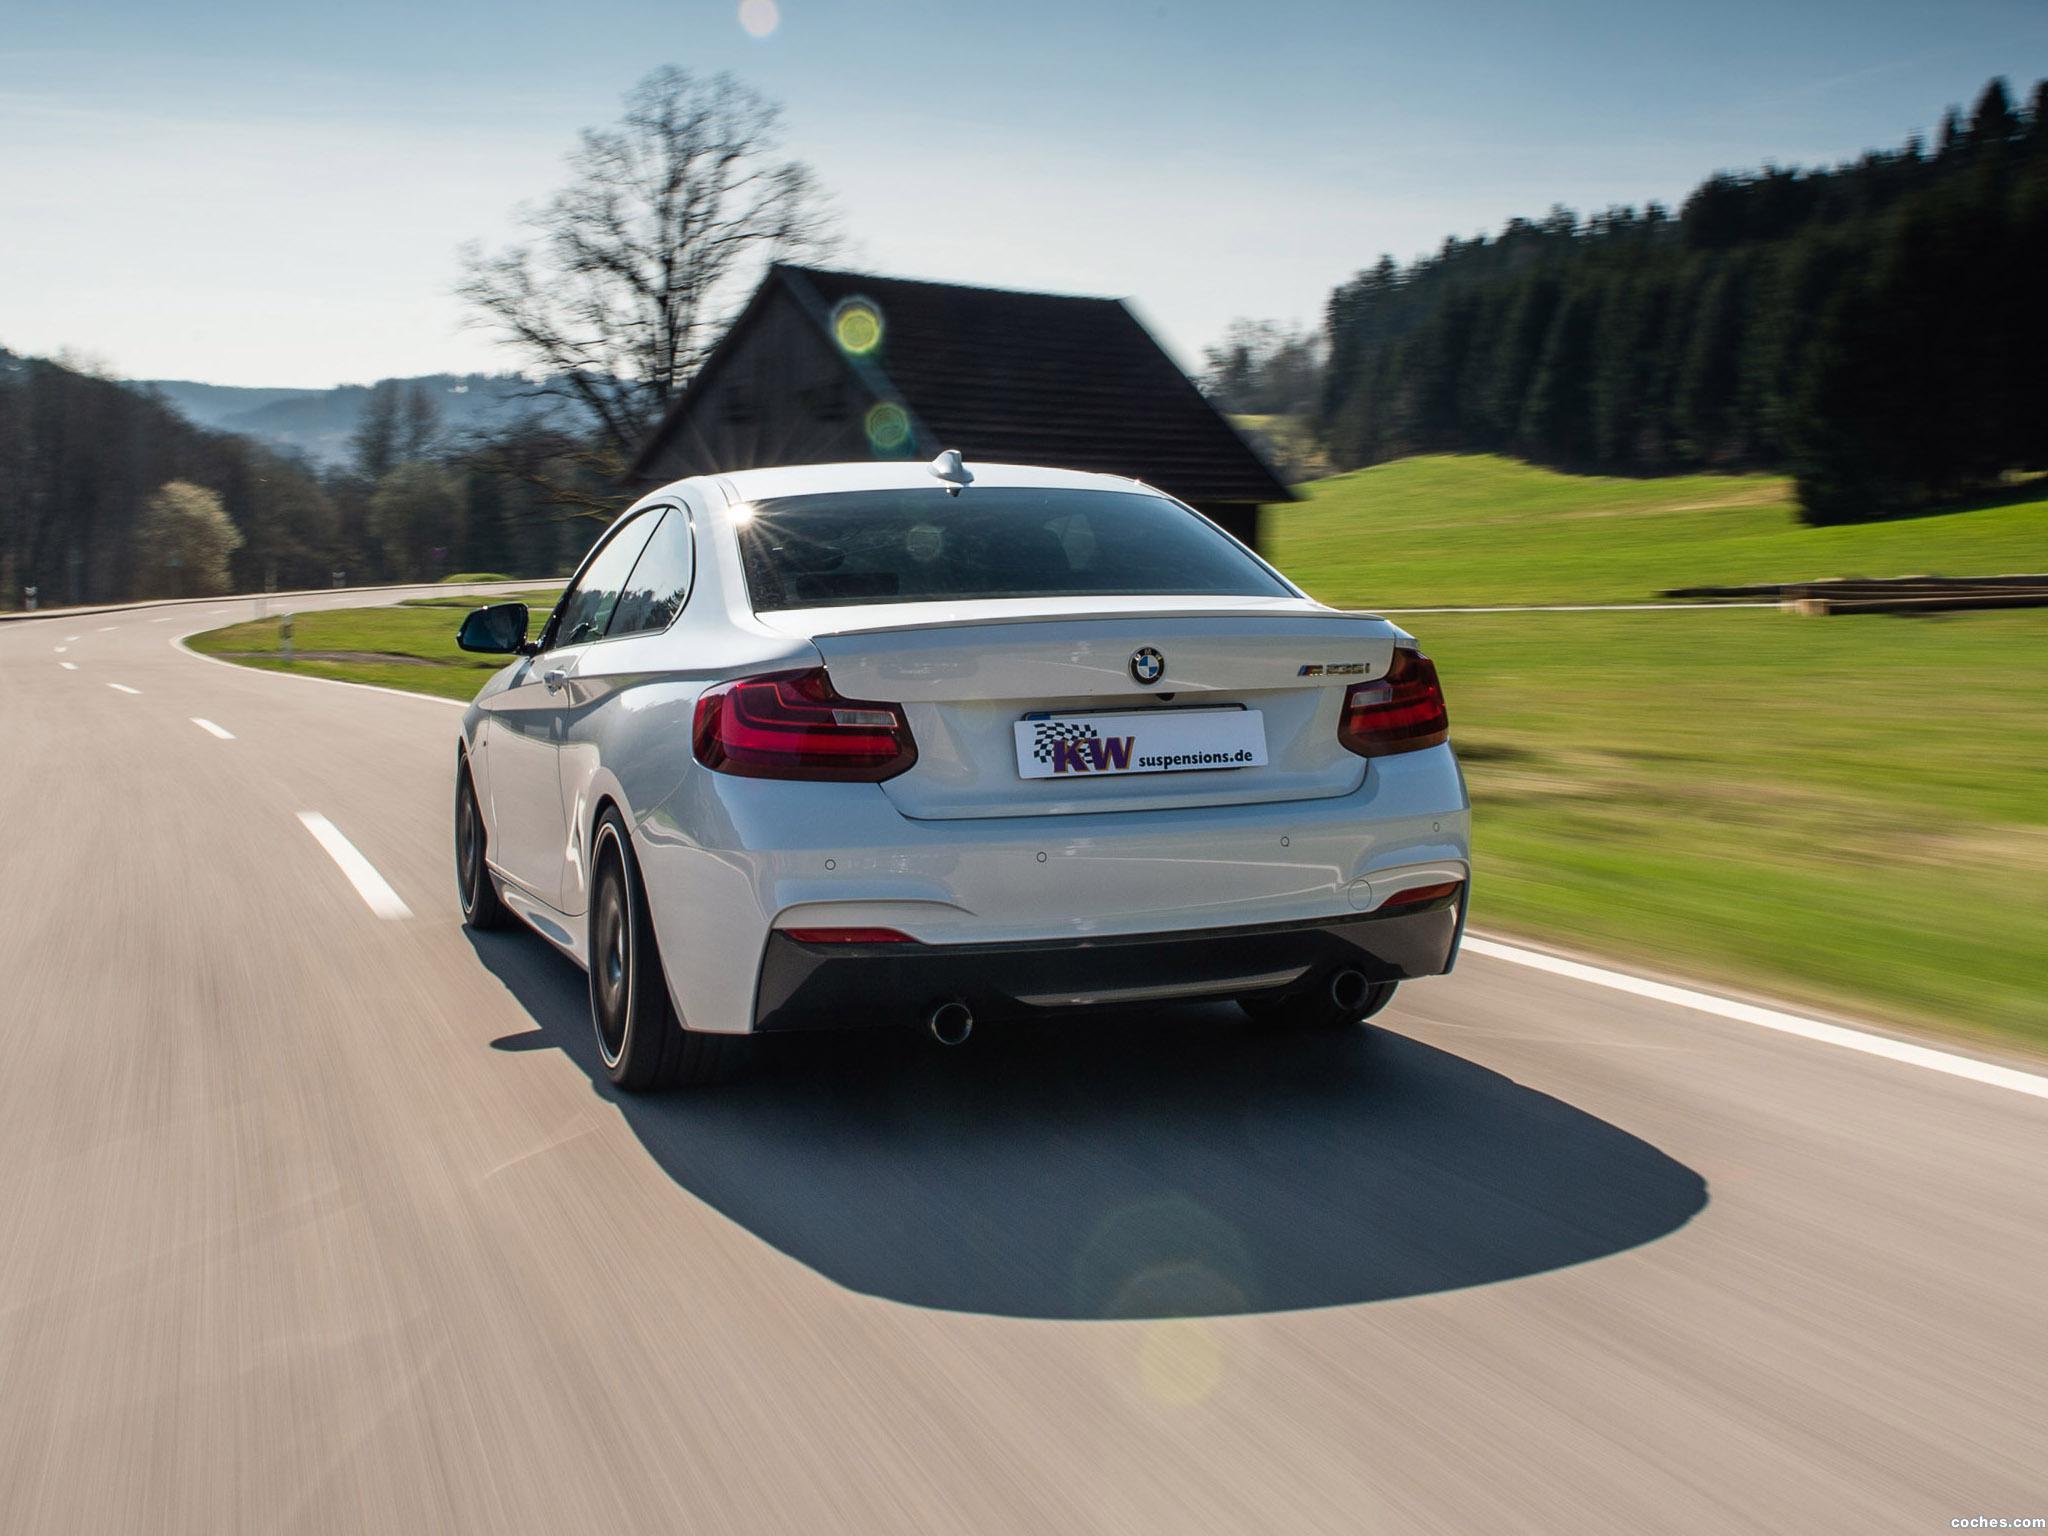 Foto 3 de BMW Serie 2 M235i KW Adaptive DDC Coilovers 2014